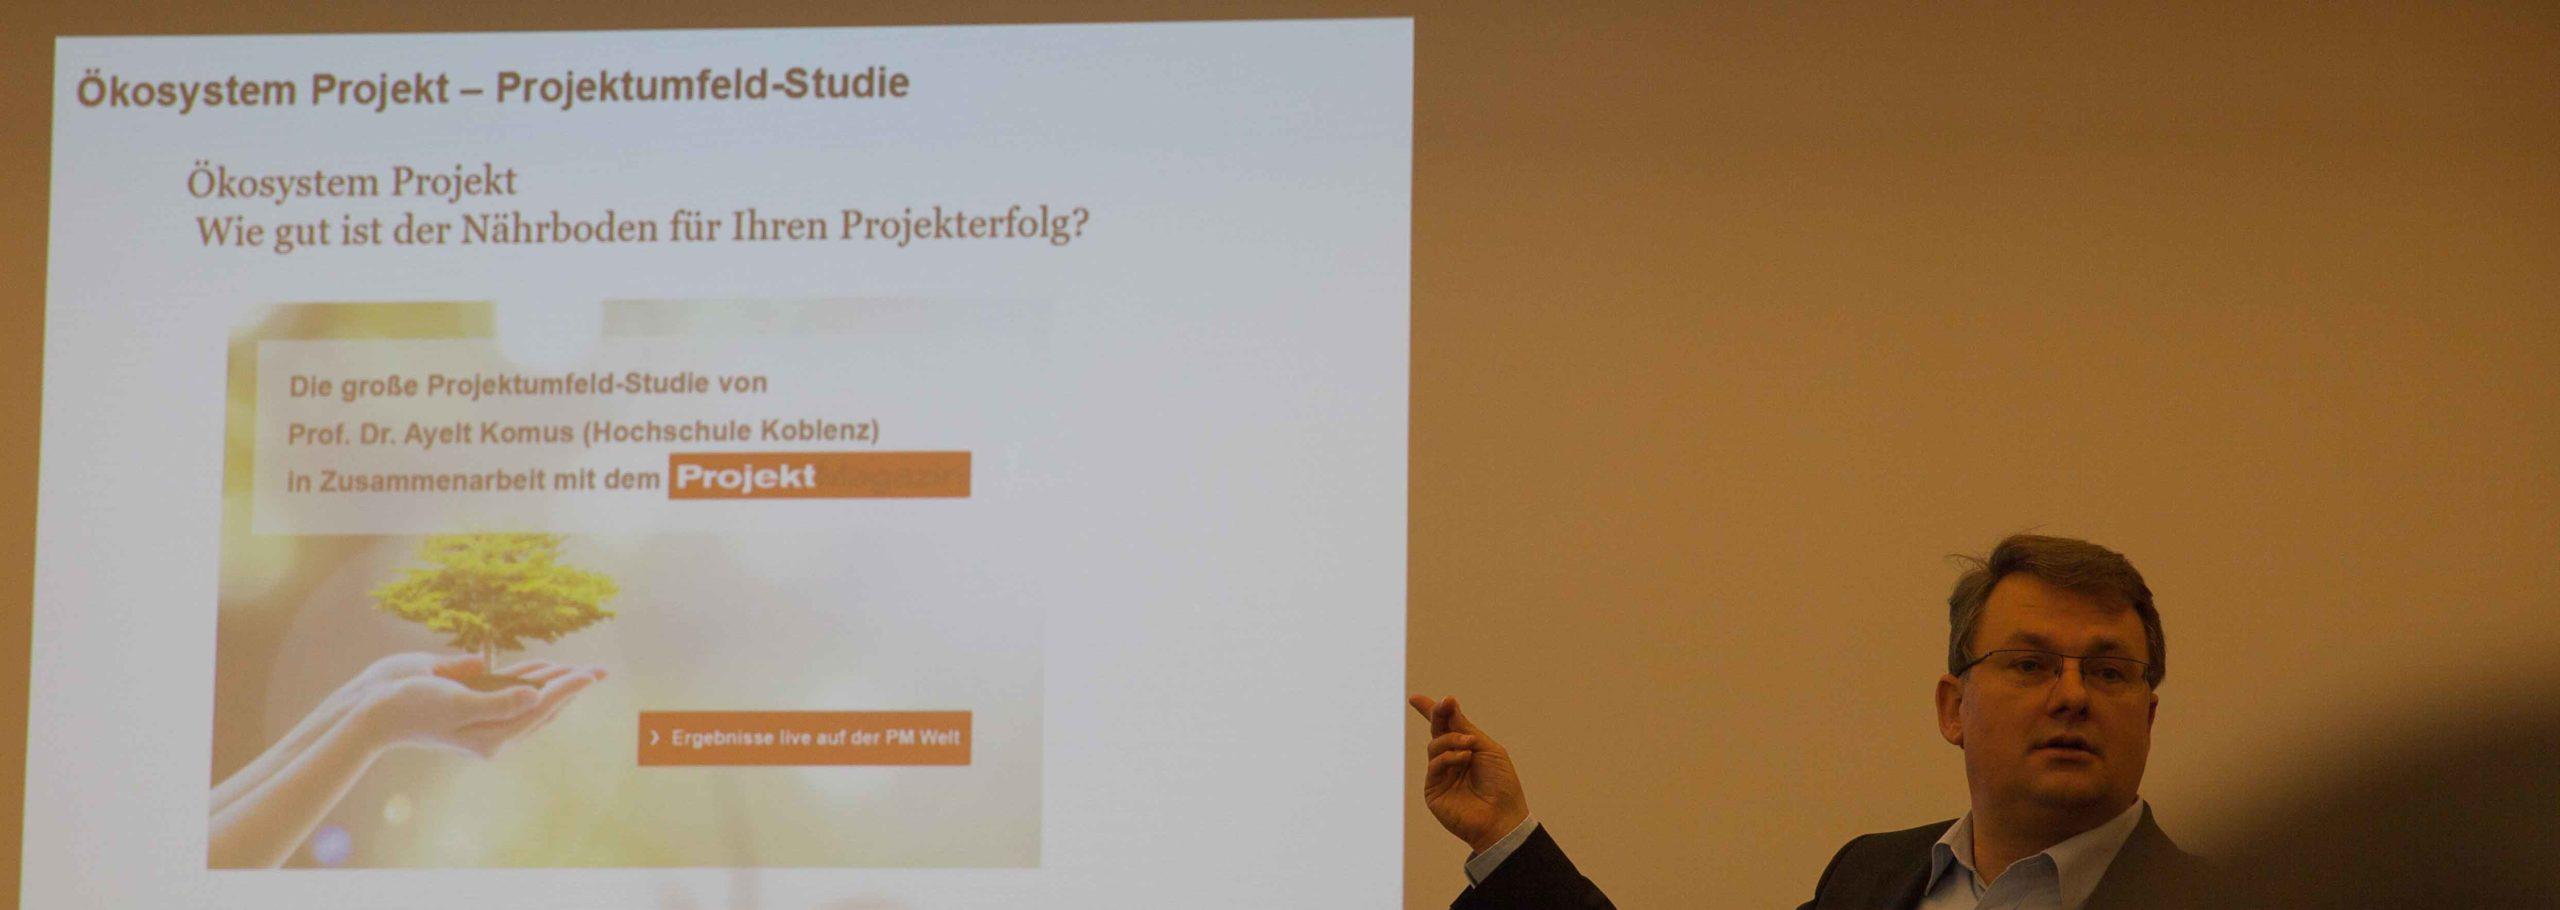 Rückblick – interaktiver Workshop: Projekterfolg vs. Projektbarrieren am 22. Jan. 2018 in Köln